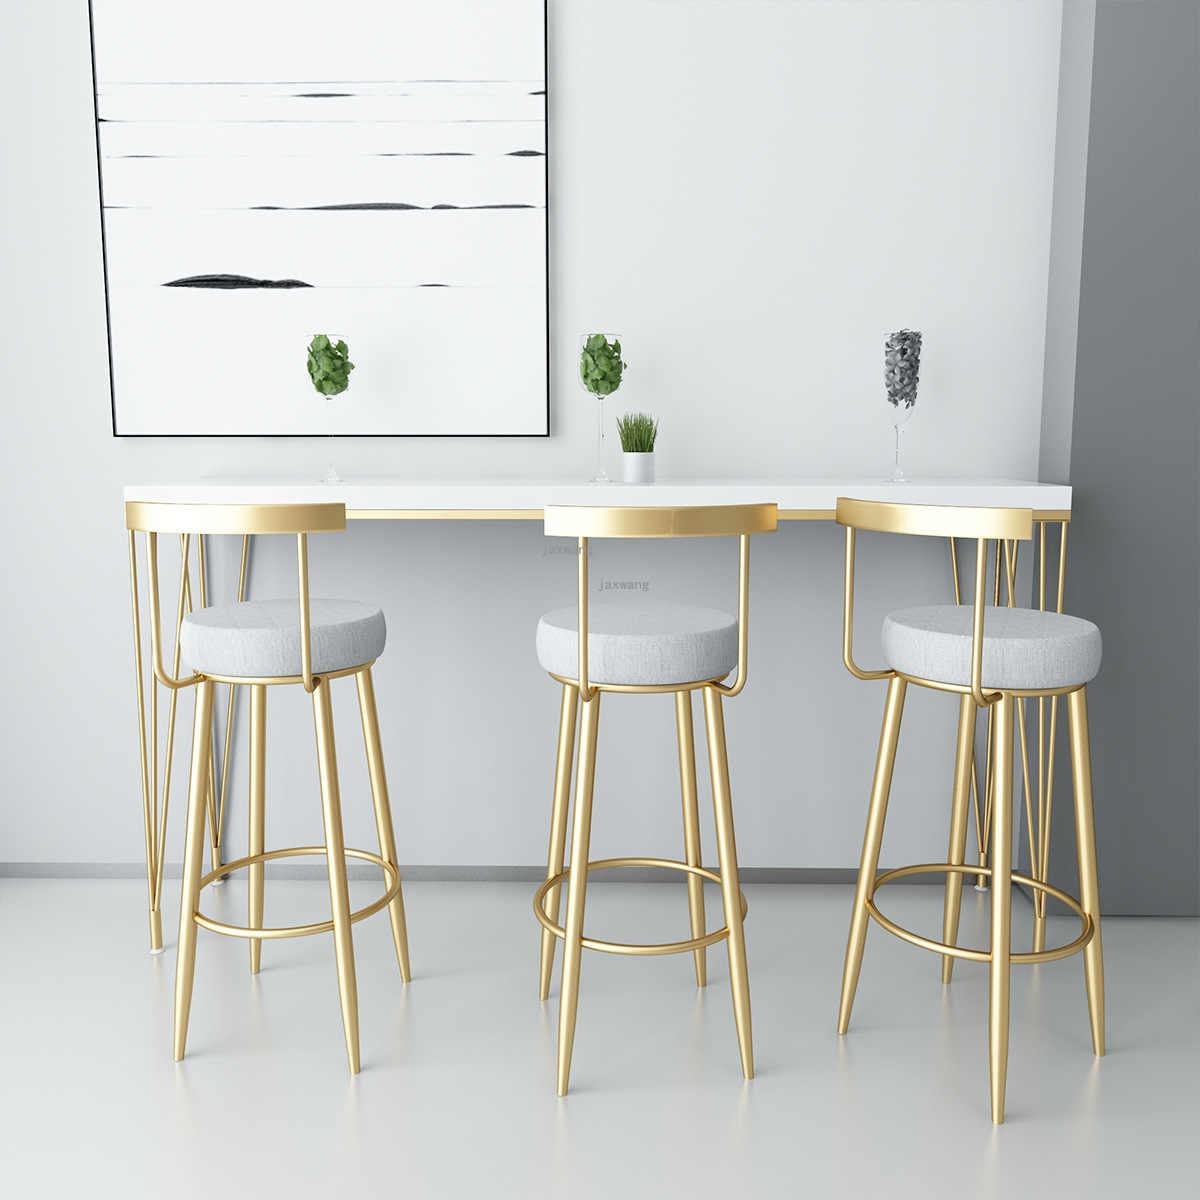 Image of: Nordic Simple Golden Bar Stool Chair Backrest High Stool Modern Bar Stool Front Restaurant Lounge Chair Aliexpress